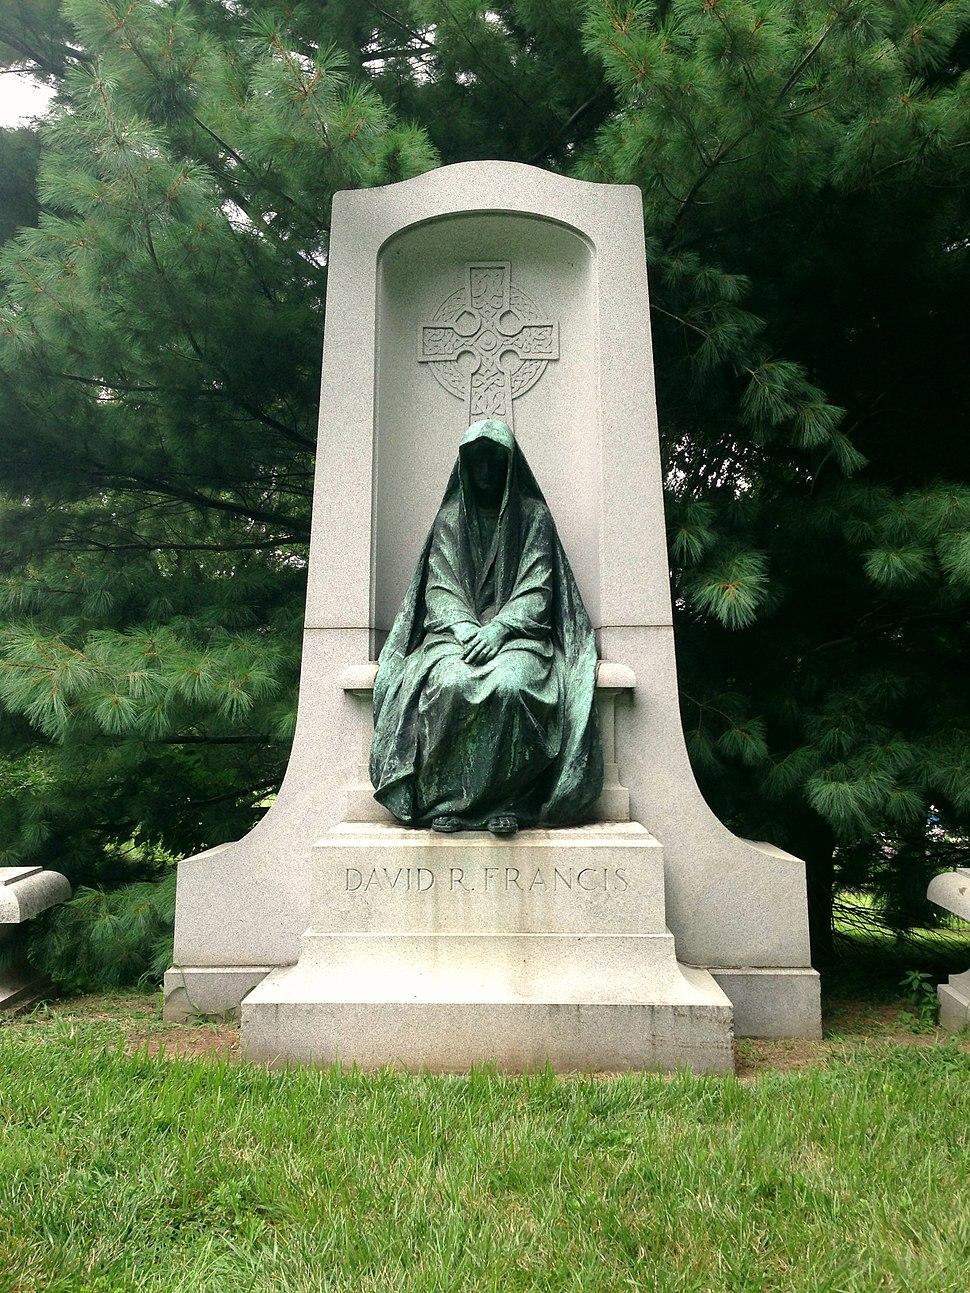 David R. Francis Grave 2013